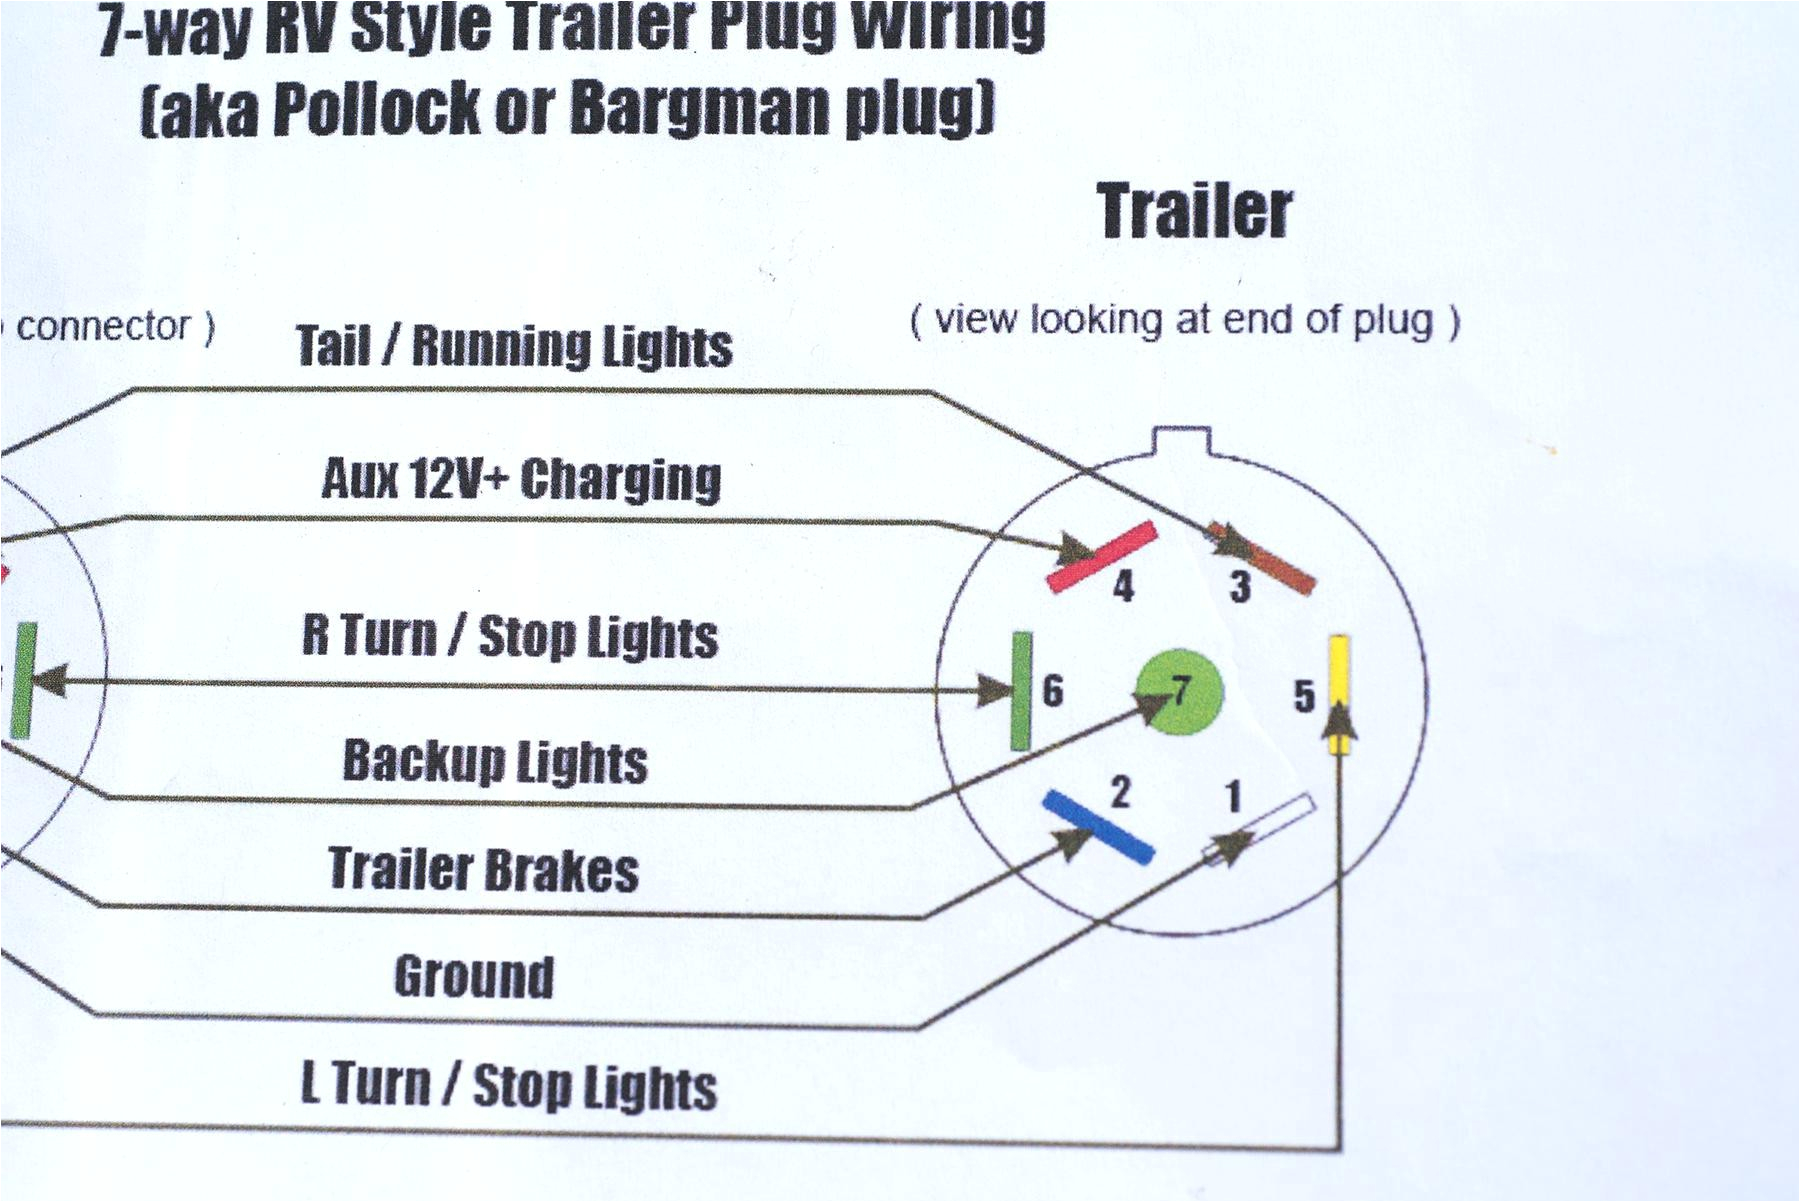 7 way truck wiring diagram elegant trailer light wiring diagram diagram of 7 way truck wiring diagram jpg